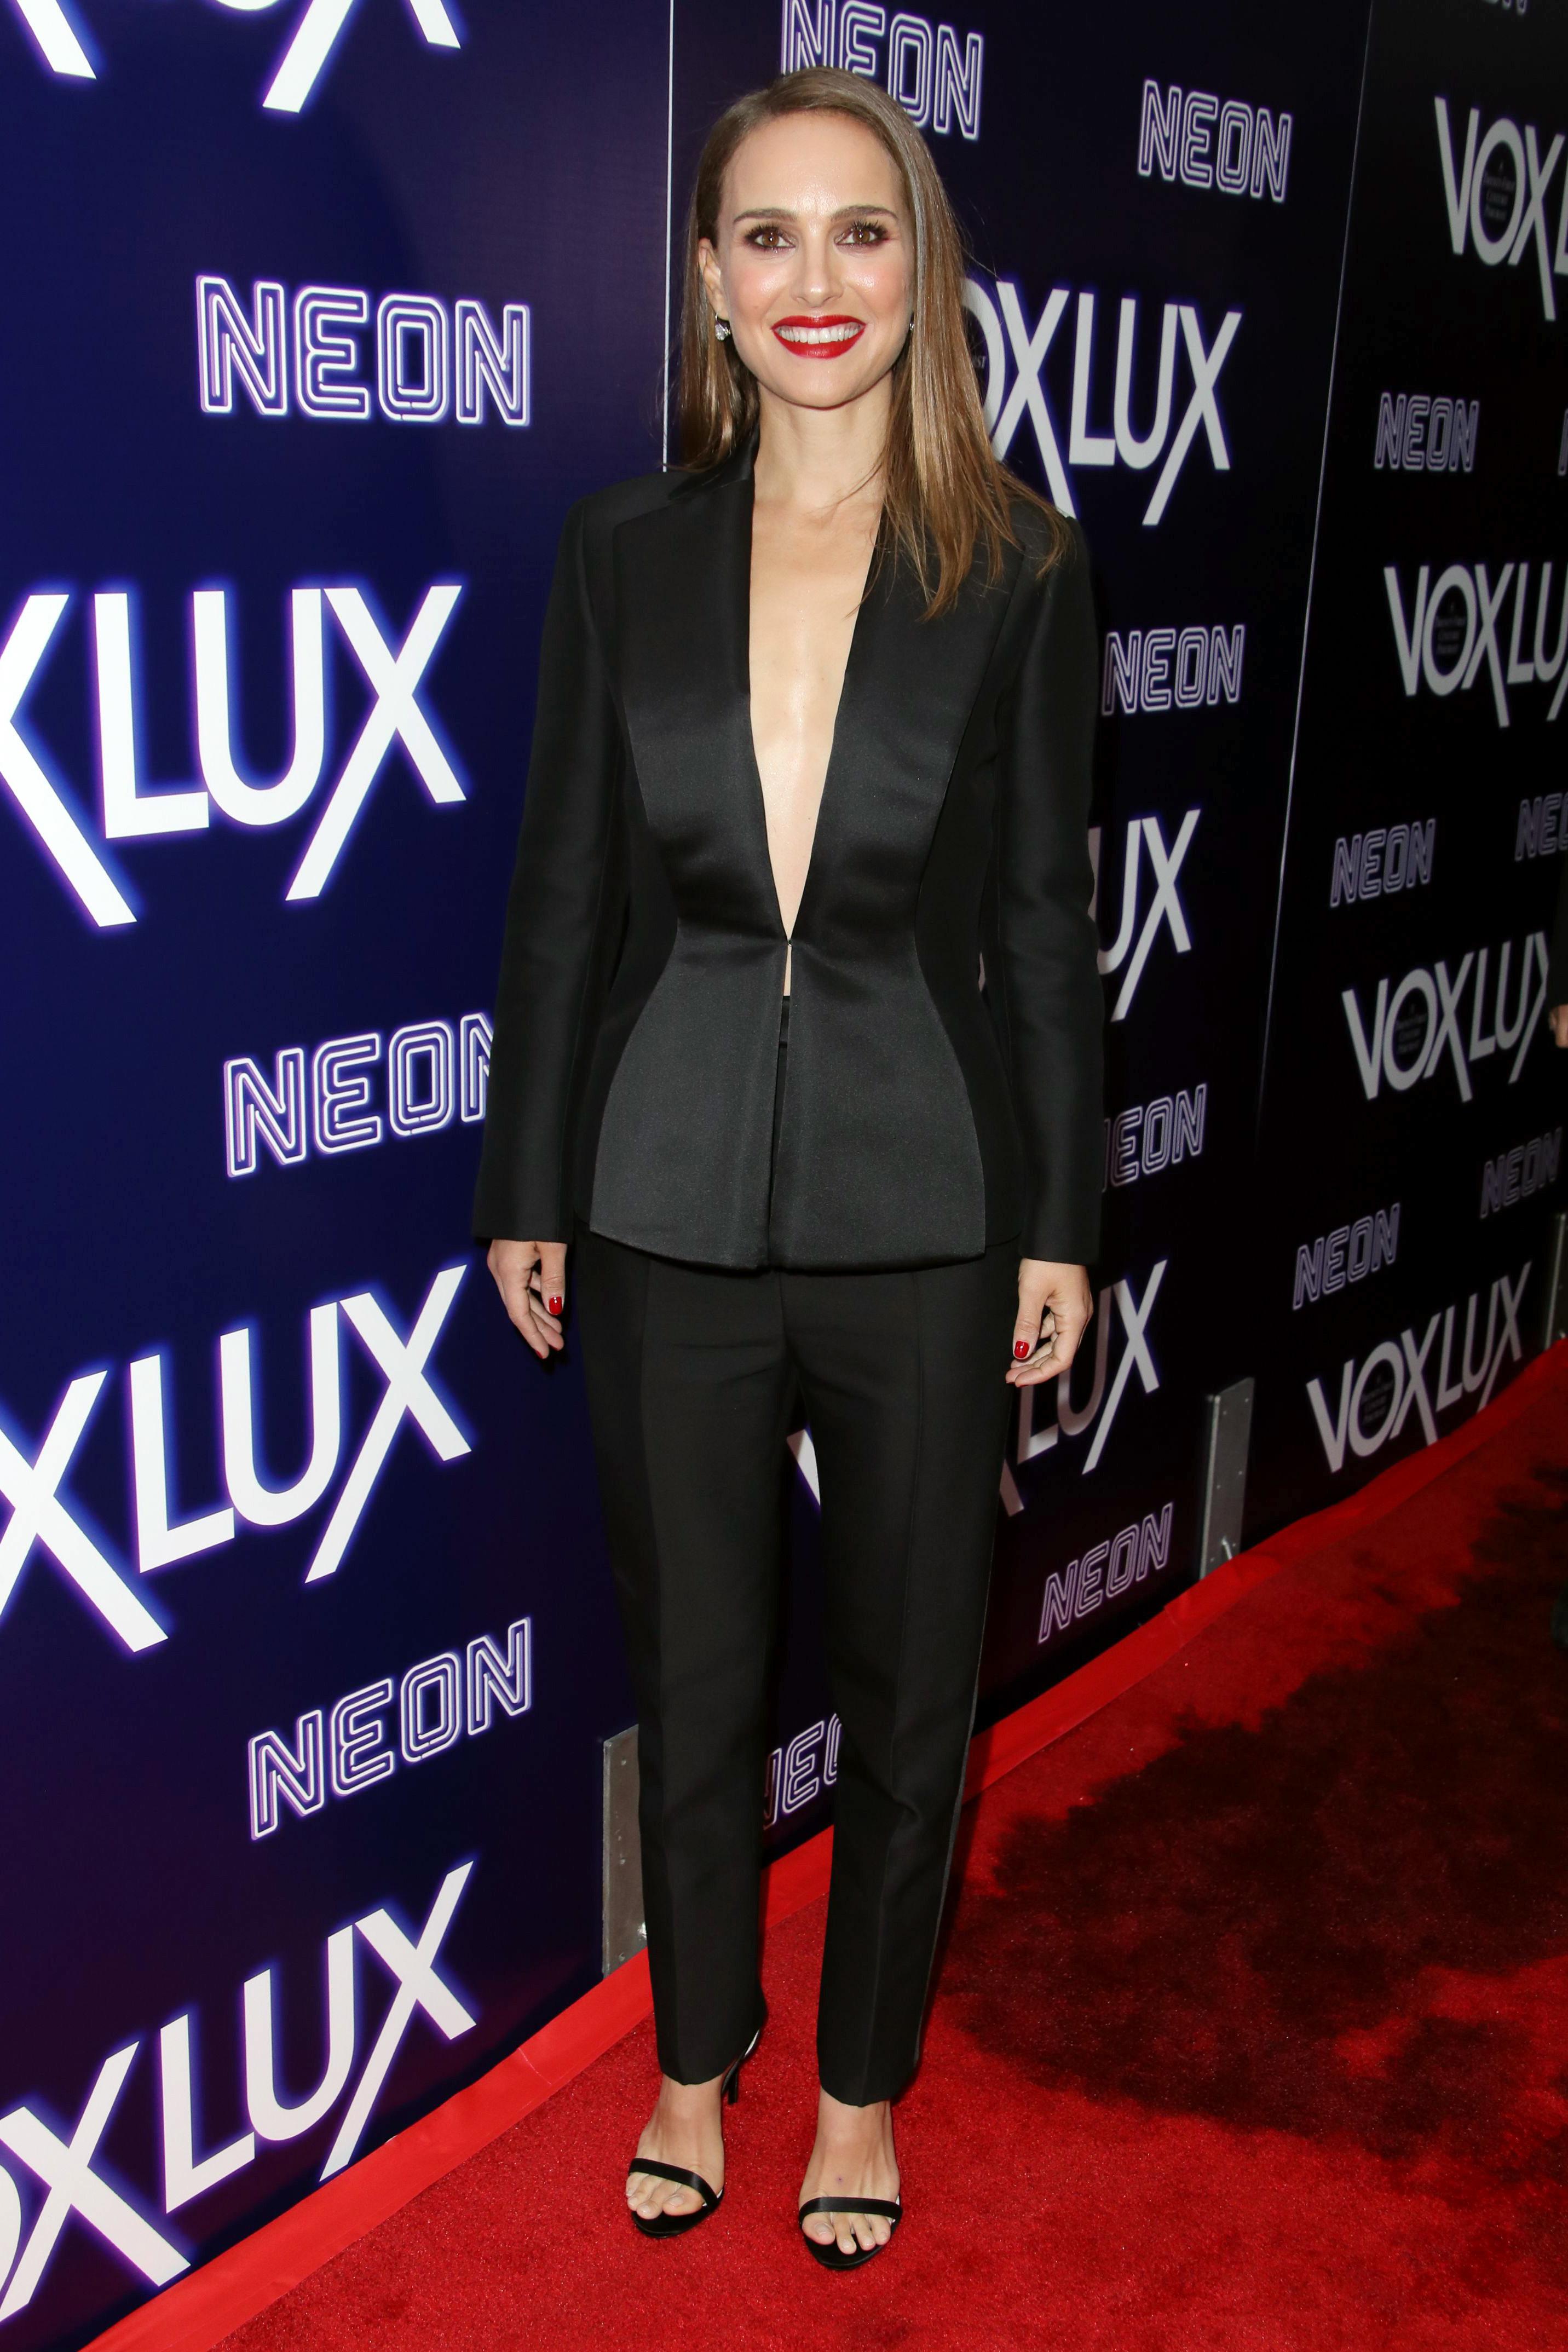 Natalie Portman attends the 'Vox Lux' film premiere in Los Angeles on Dec. 5, 2018.